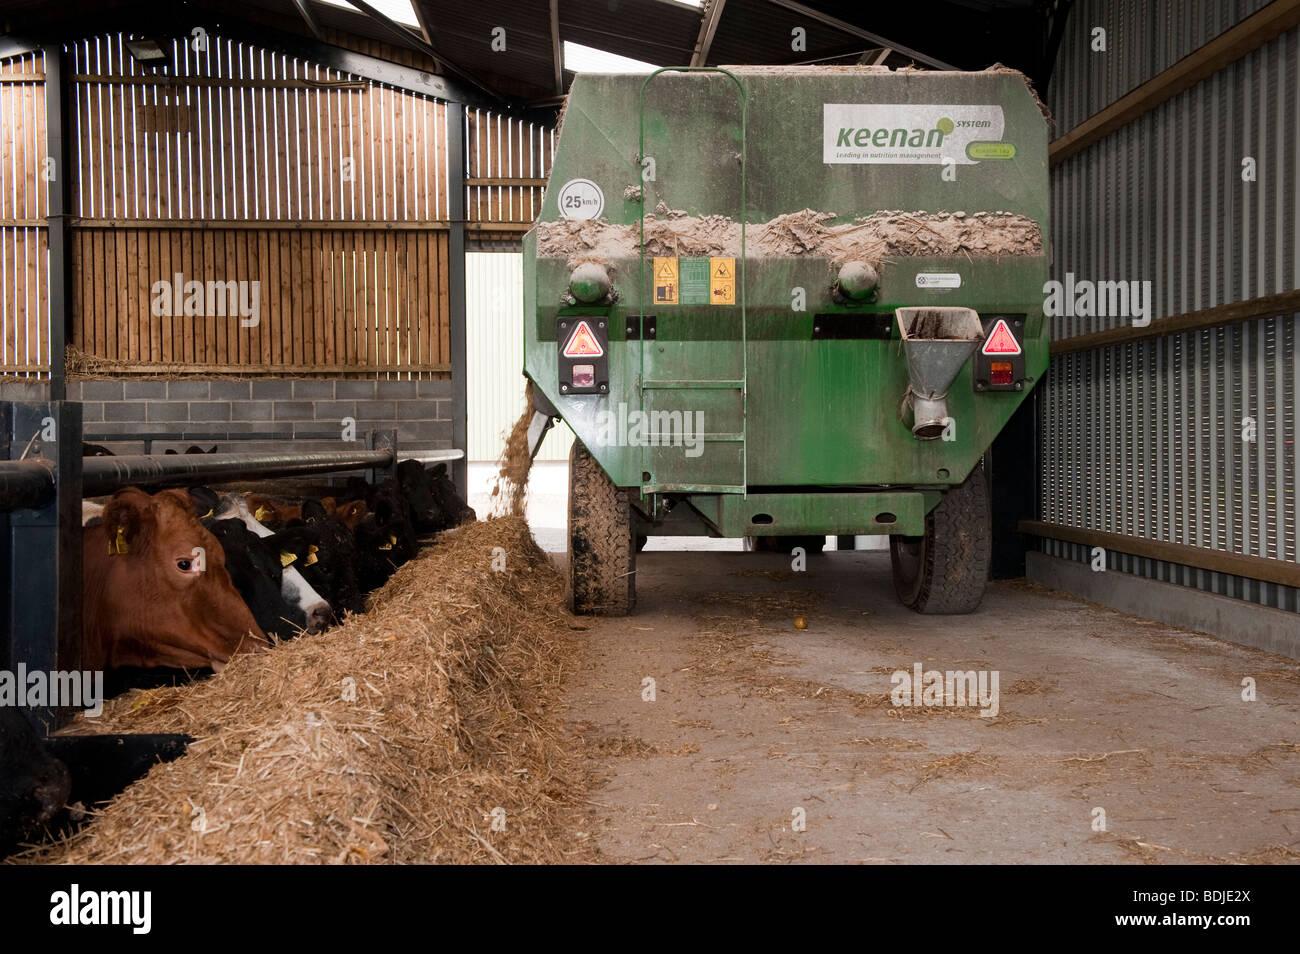 Livestock diet mixer feeding beef cattle in farm building. - Stock Image